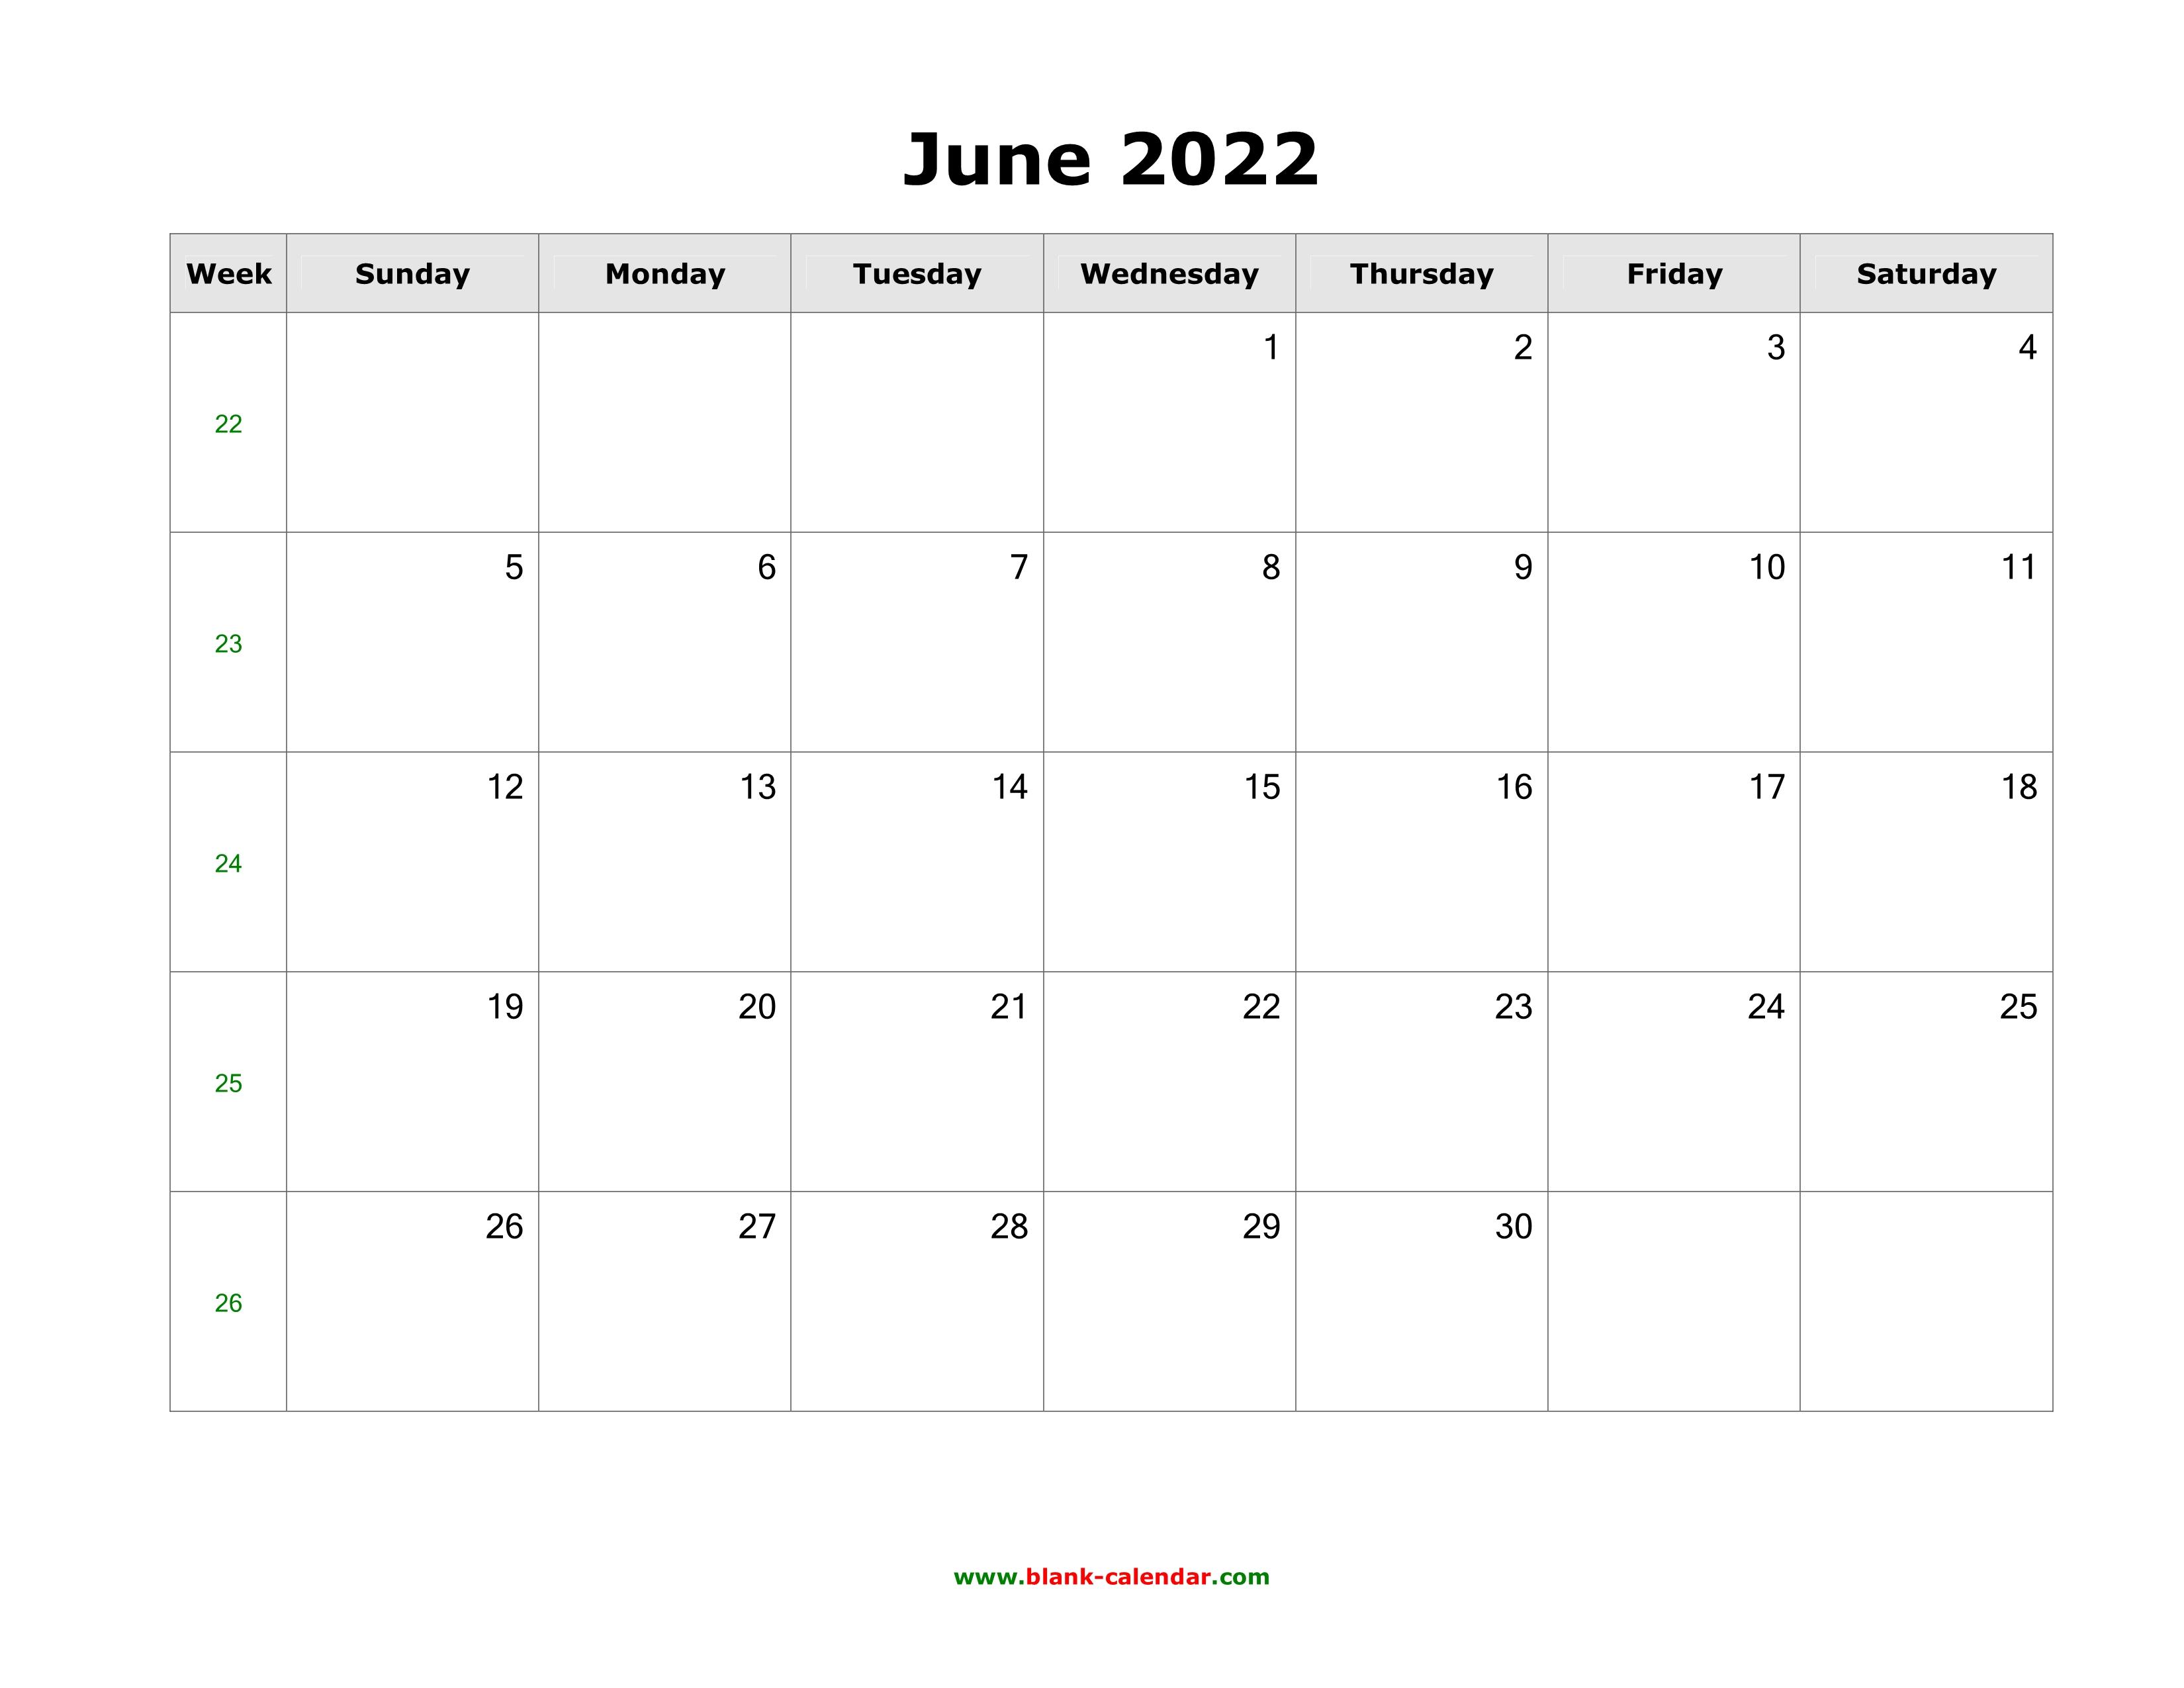 June 2022 Blank Calendar.Download June 2022 Blank Calendar With Us Holidays Horizontal